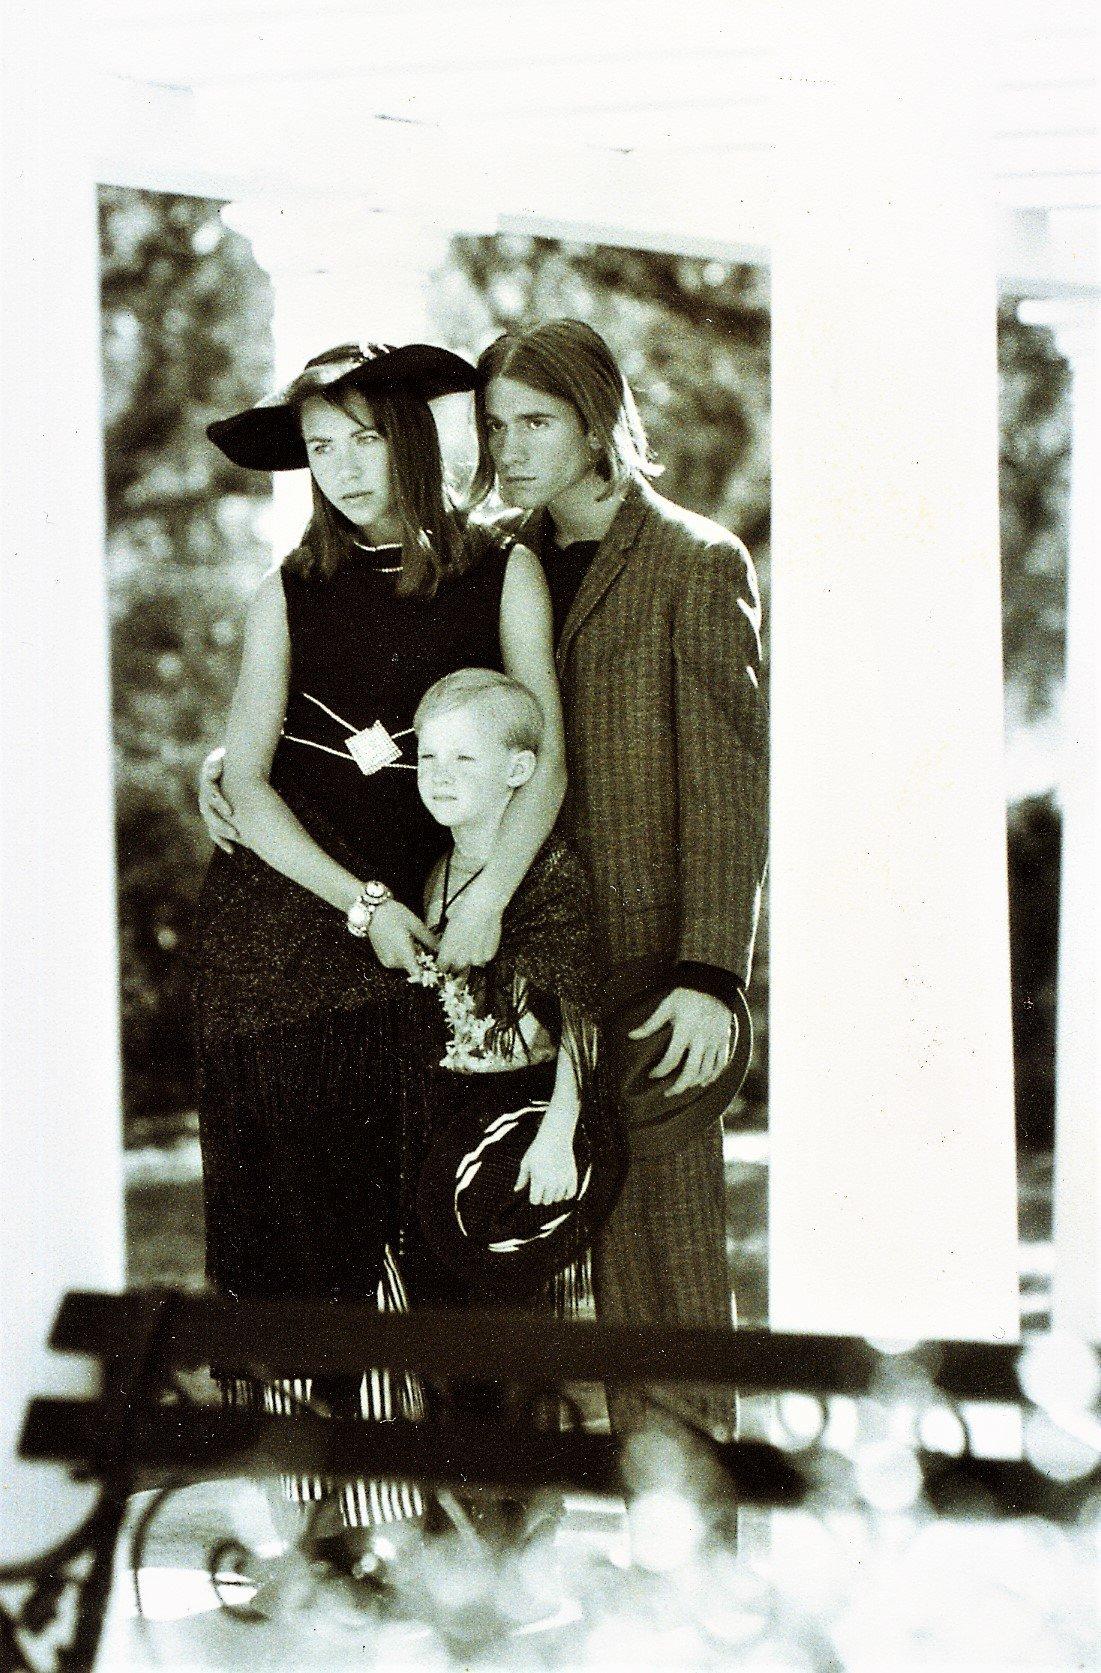 MODELS -  JENNIFER, NICK AND CHILDS FAMILY PORTRAIT.